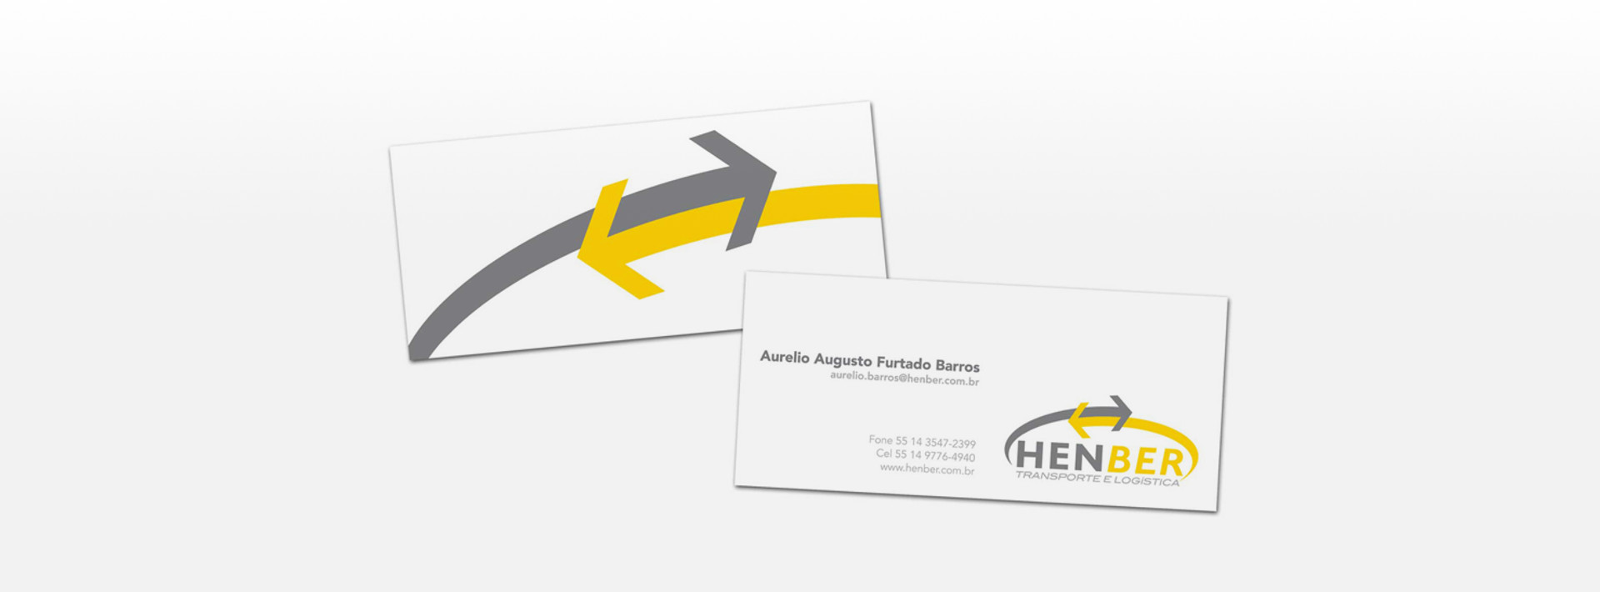 henber-2